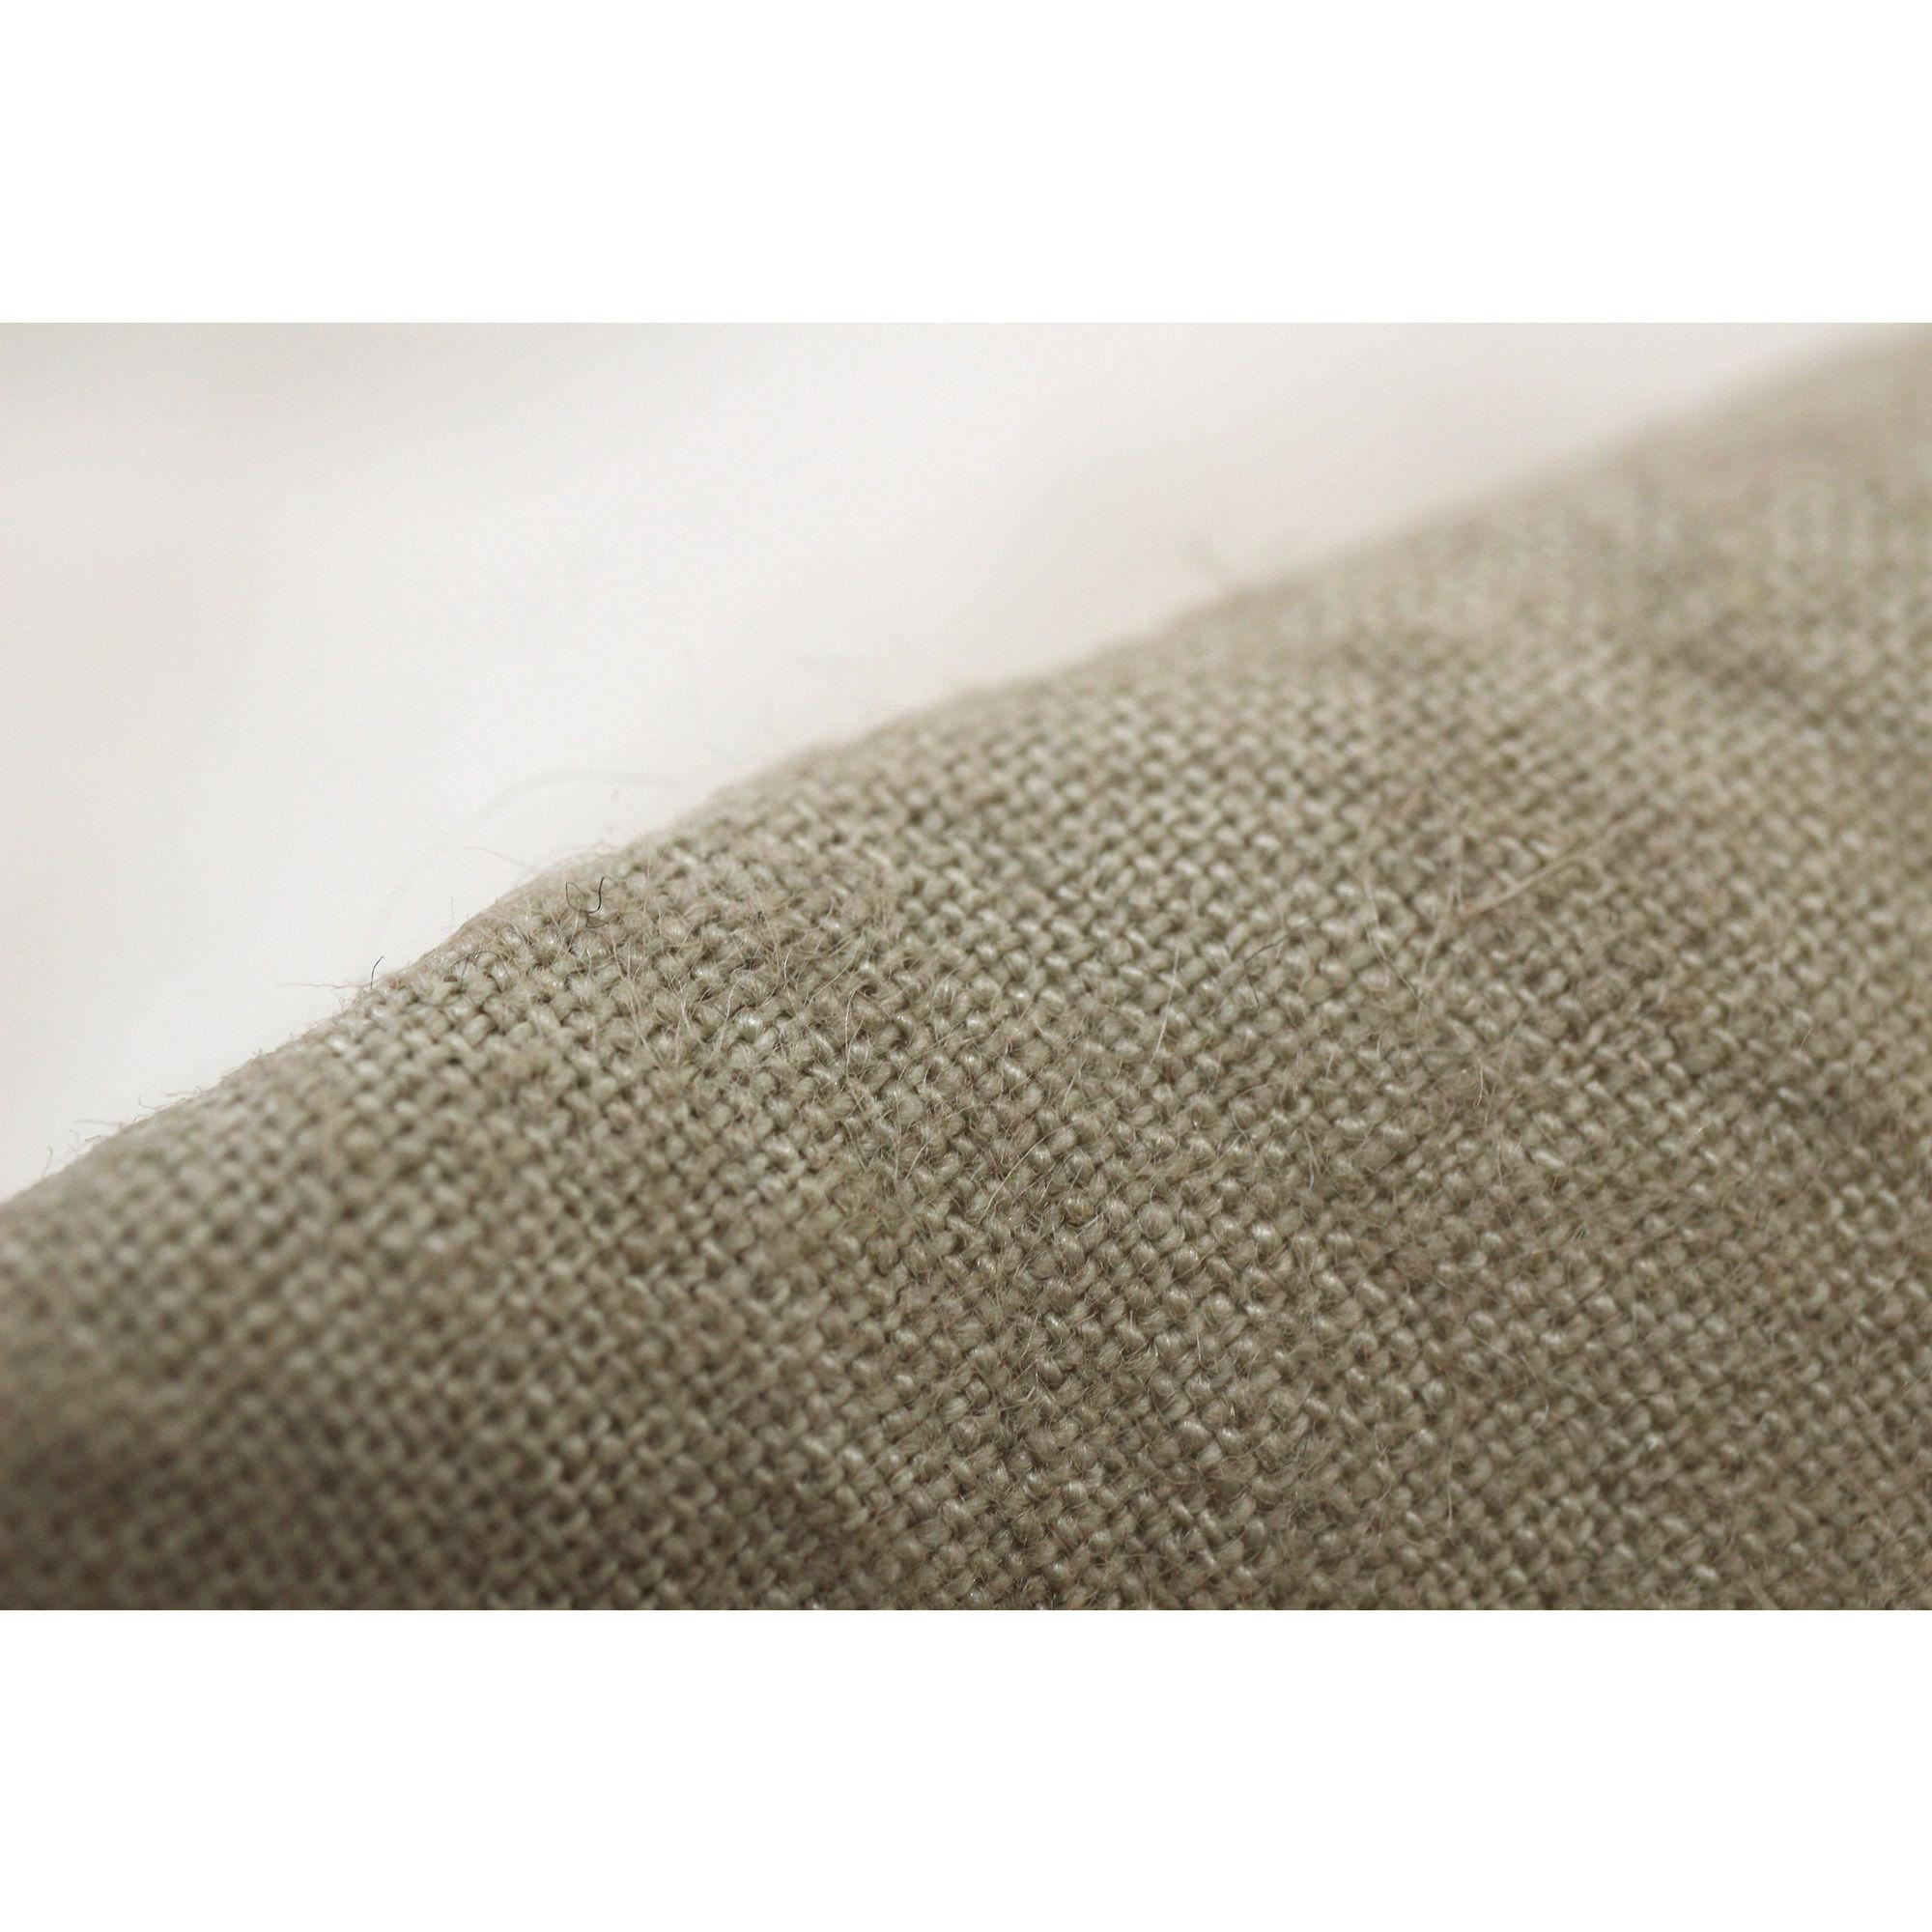 fanageラミー50%リネン50% 25番手糸使用 平織り生地/1m